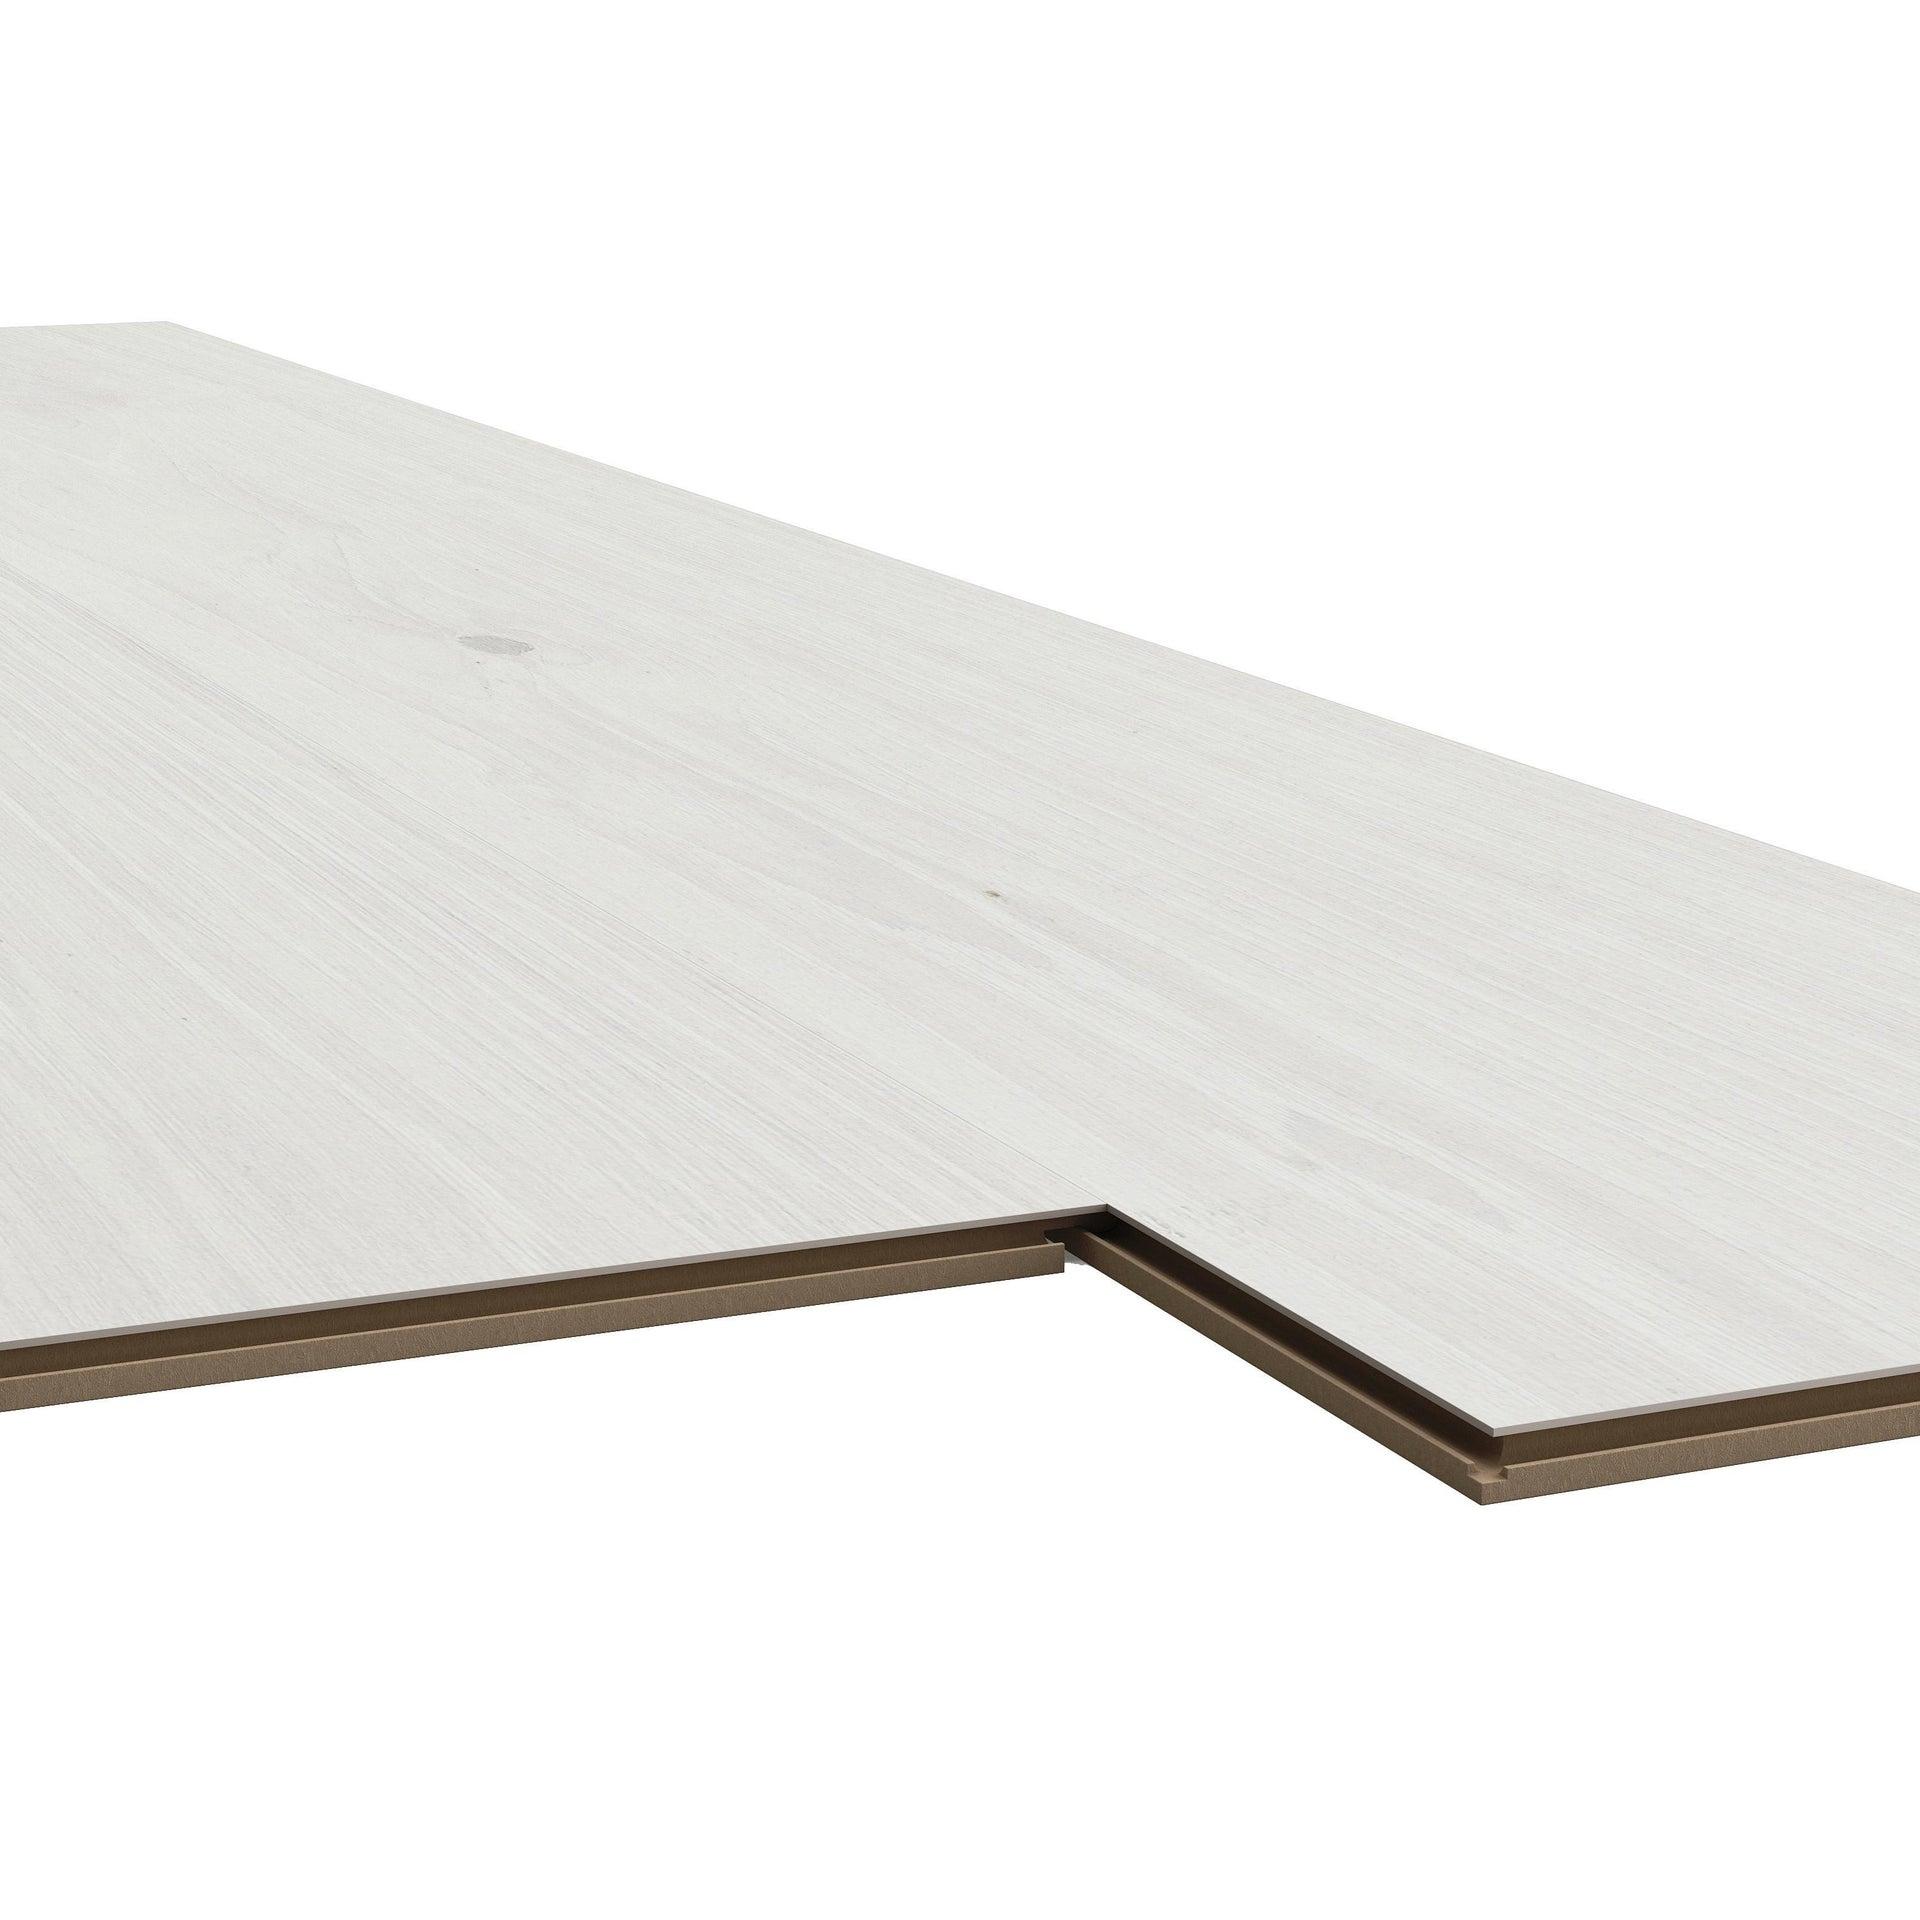 Pavimento laminato Vasa Sp 7 mm bianco - 2